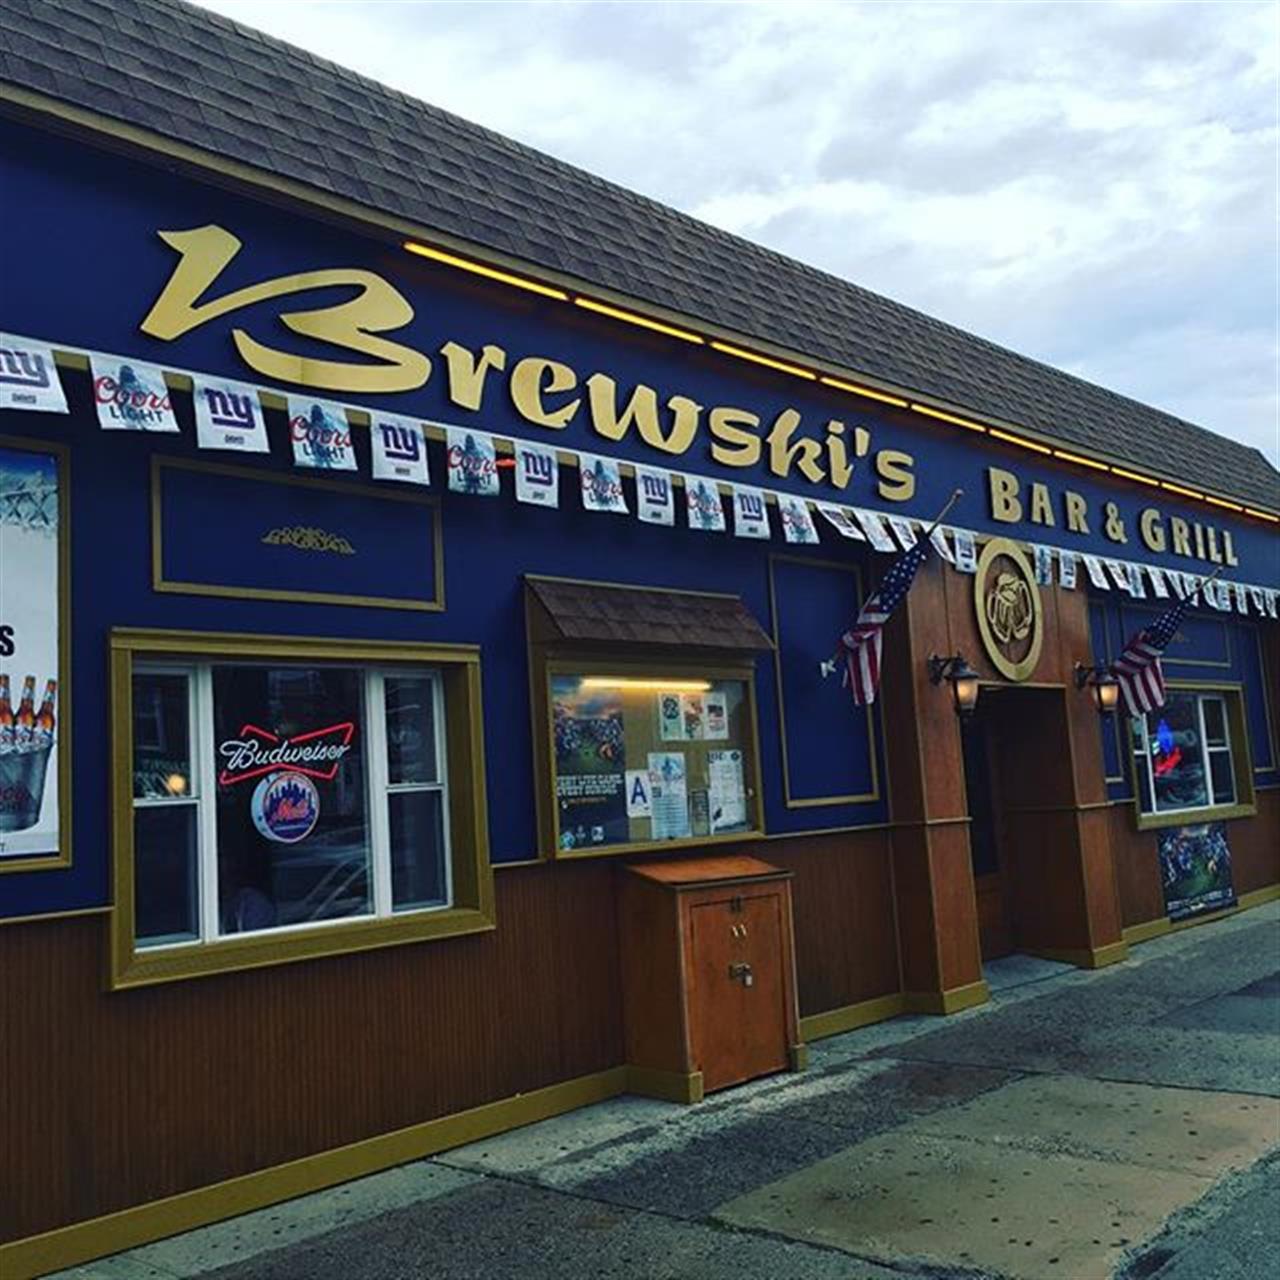 #TheBronxIs Brewskies Located in #throggsneck great place to watch the #nyjets #nygiants  #OSCARRIGAMONTY #OR #OPOTD #Bronx #RealEstate #trulia #realtor #zillow #homes #property #newyorkcity #NYC #bronxdoesitbest #eyesonthebronx #pantigagroup #brewskis #leadingre #bronx